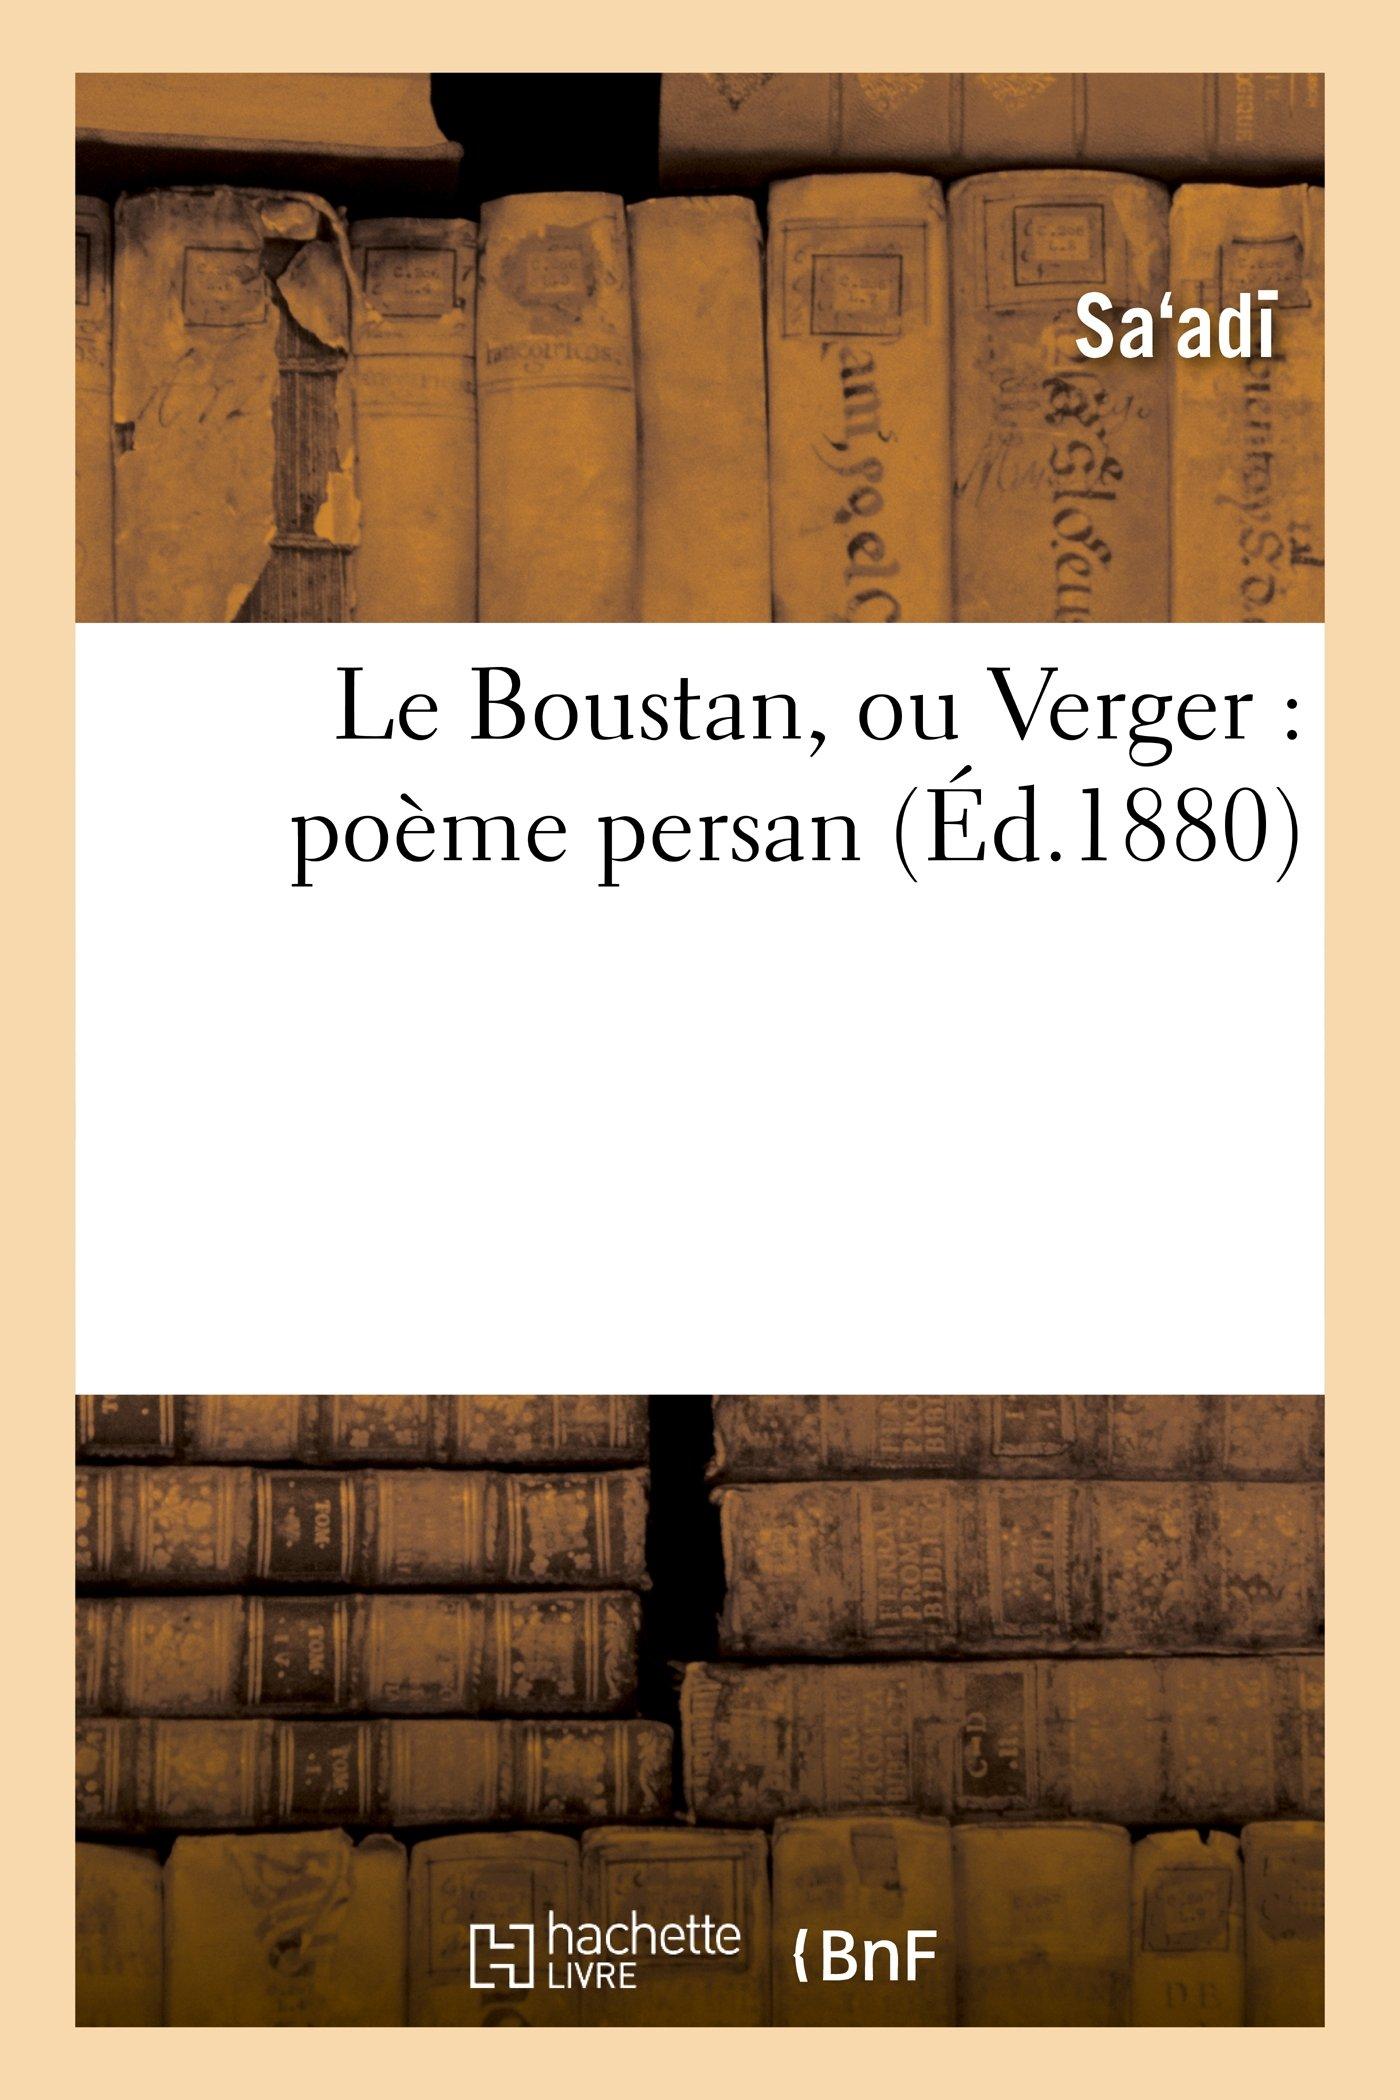 Le Boustan, Ou Verger: Poeme Persan (Litterature) (French Edition) PDF